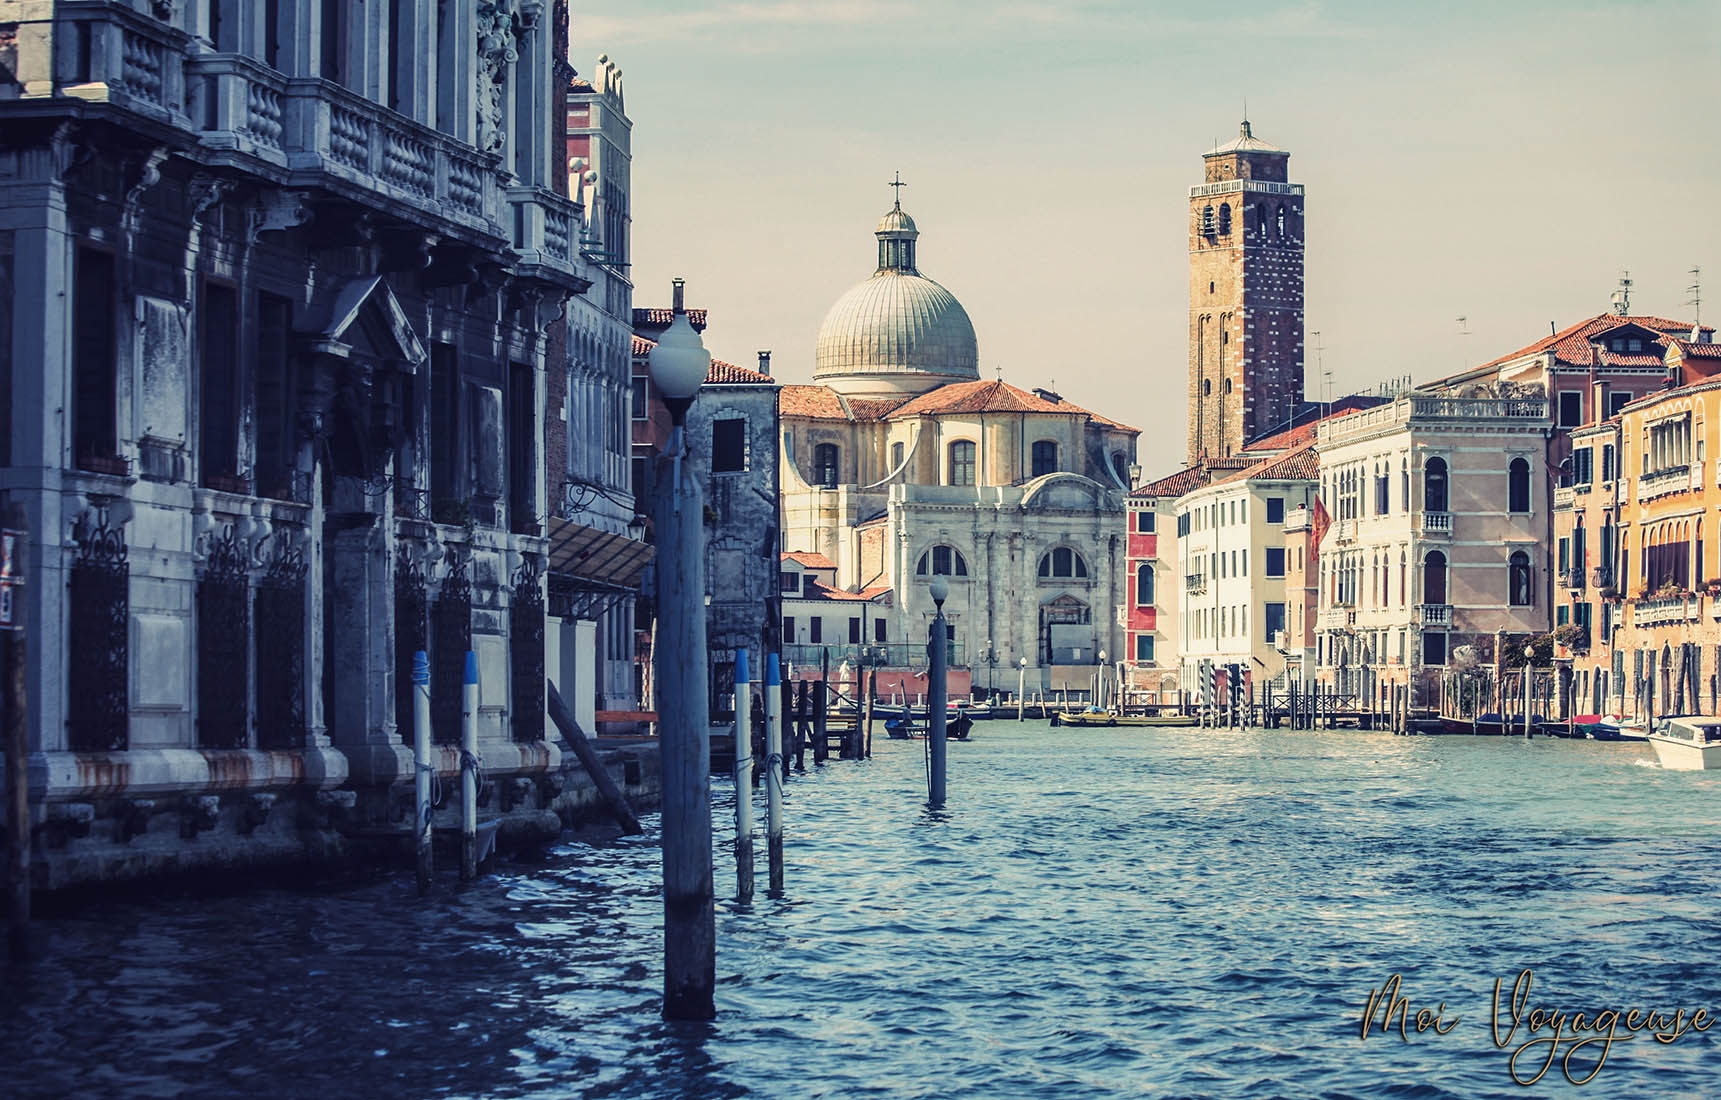 Grand Canal de Venise Italie Europe gare